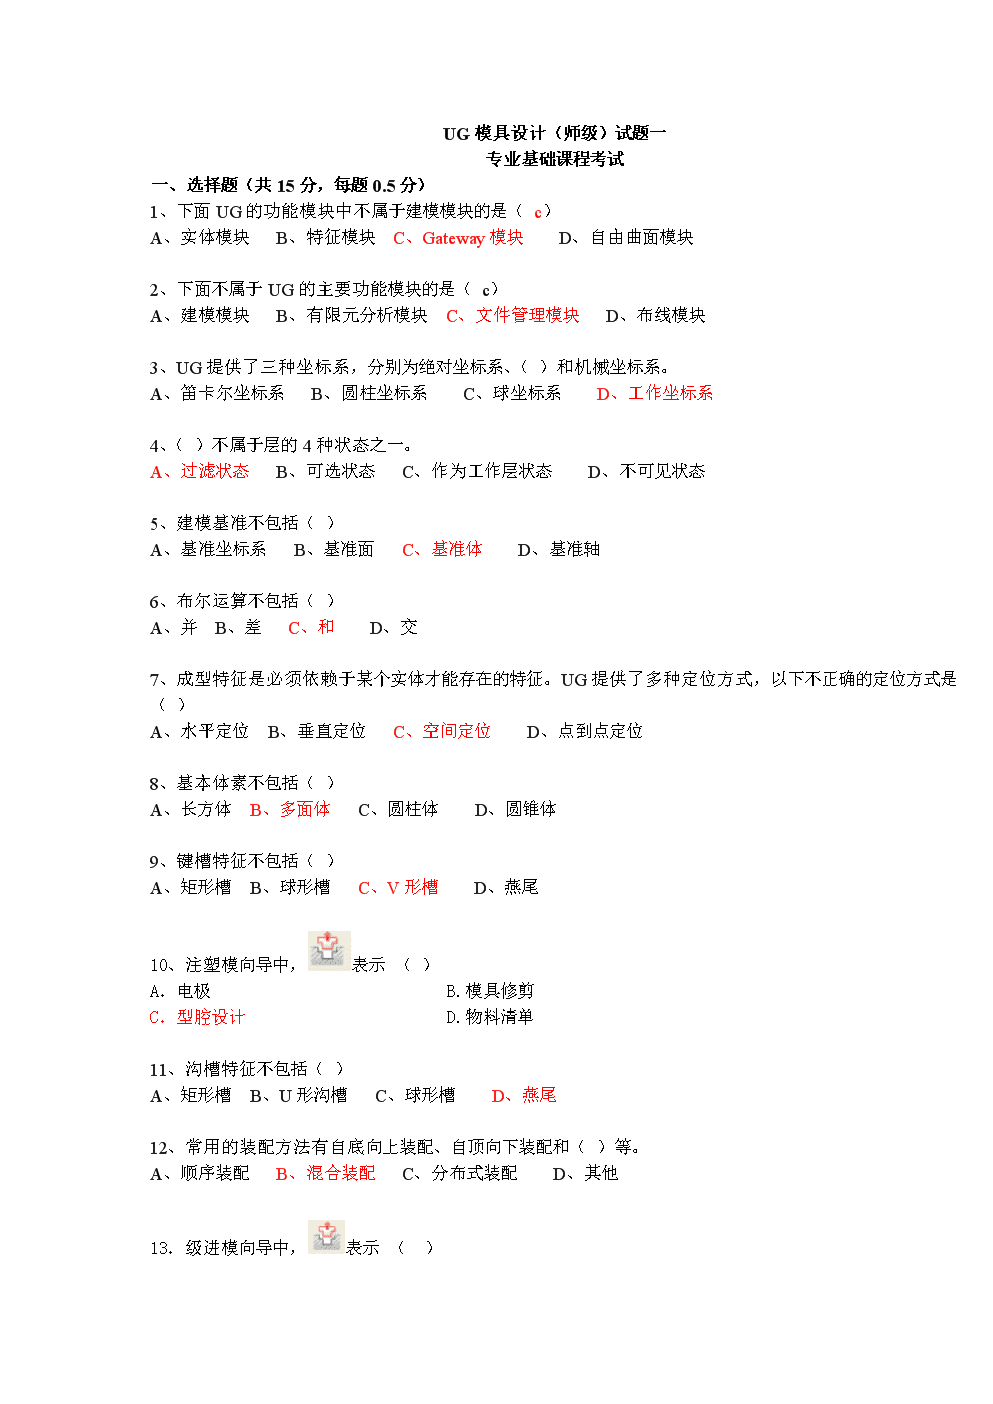 UG模具设计(师级)试题一专业基础课程考试.doc